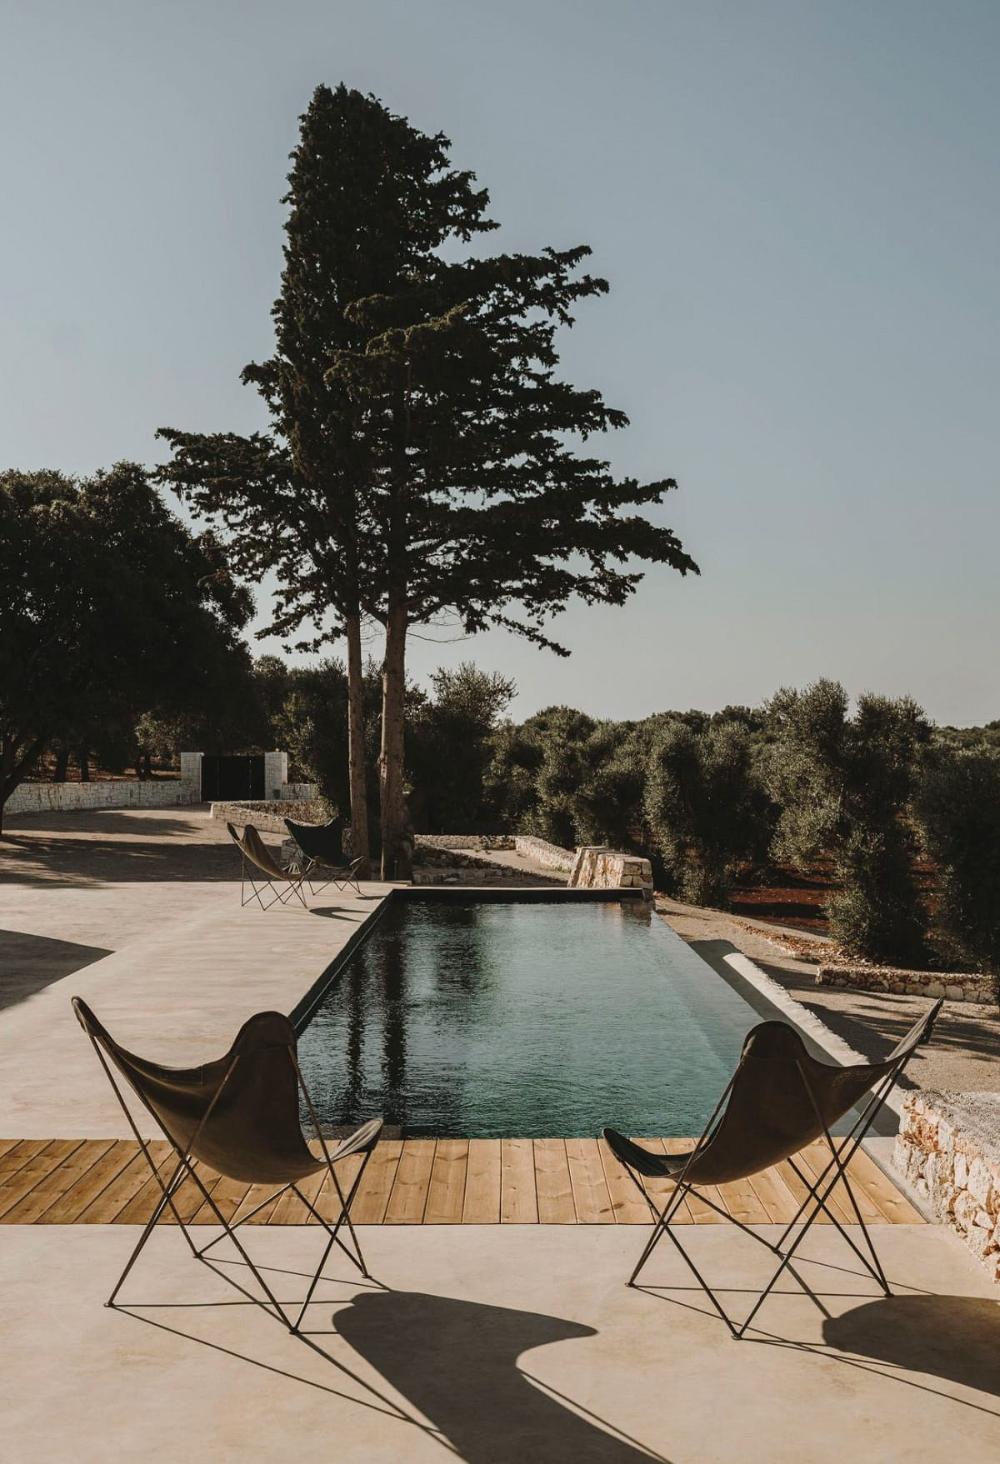 Tenuta Masseriola In Carovigno Puglia Design Visual In 2020 Pool Designs Exterior Design Architecture Design